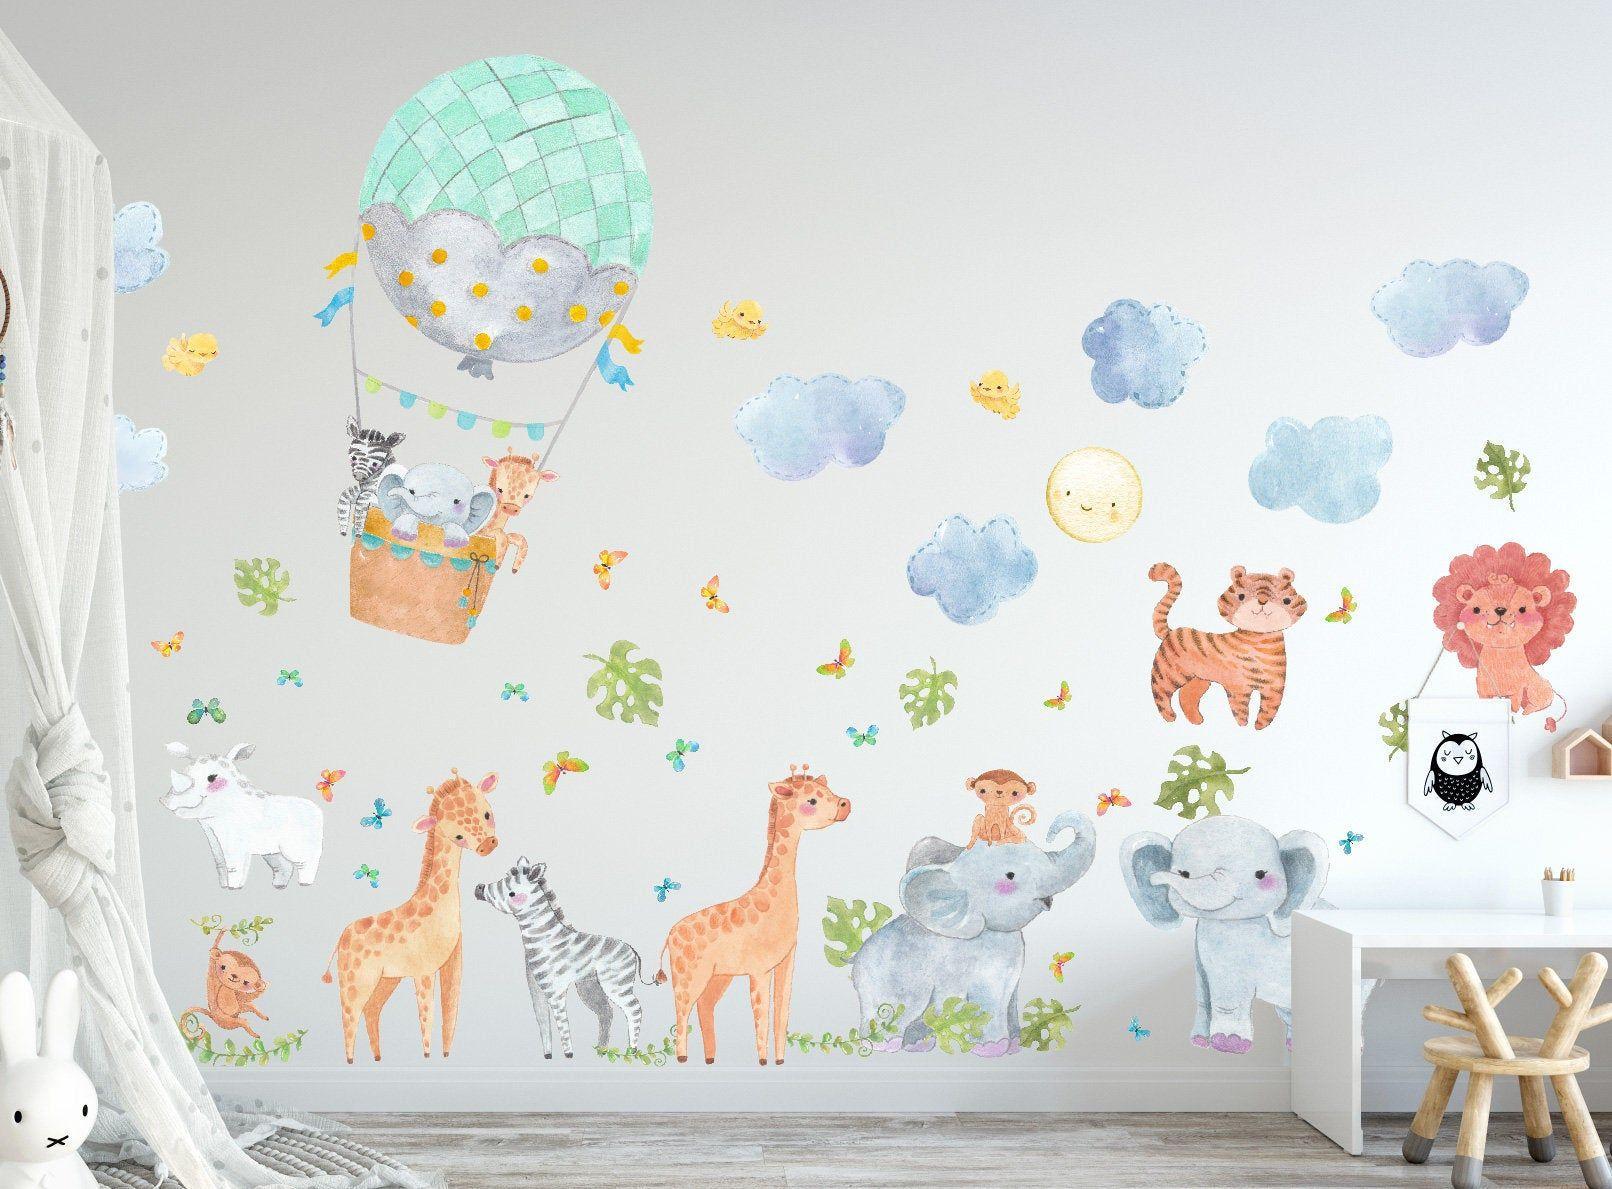 Jungle Animals Decals, Safari Wall Decals, Hot Balloons